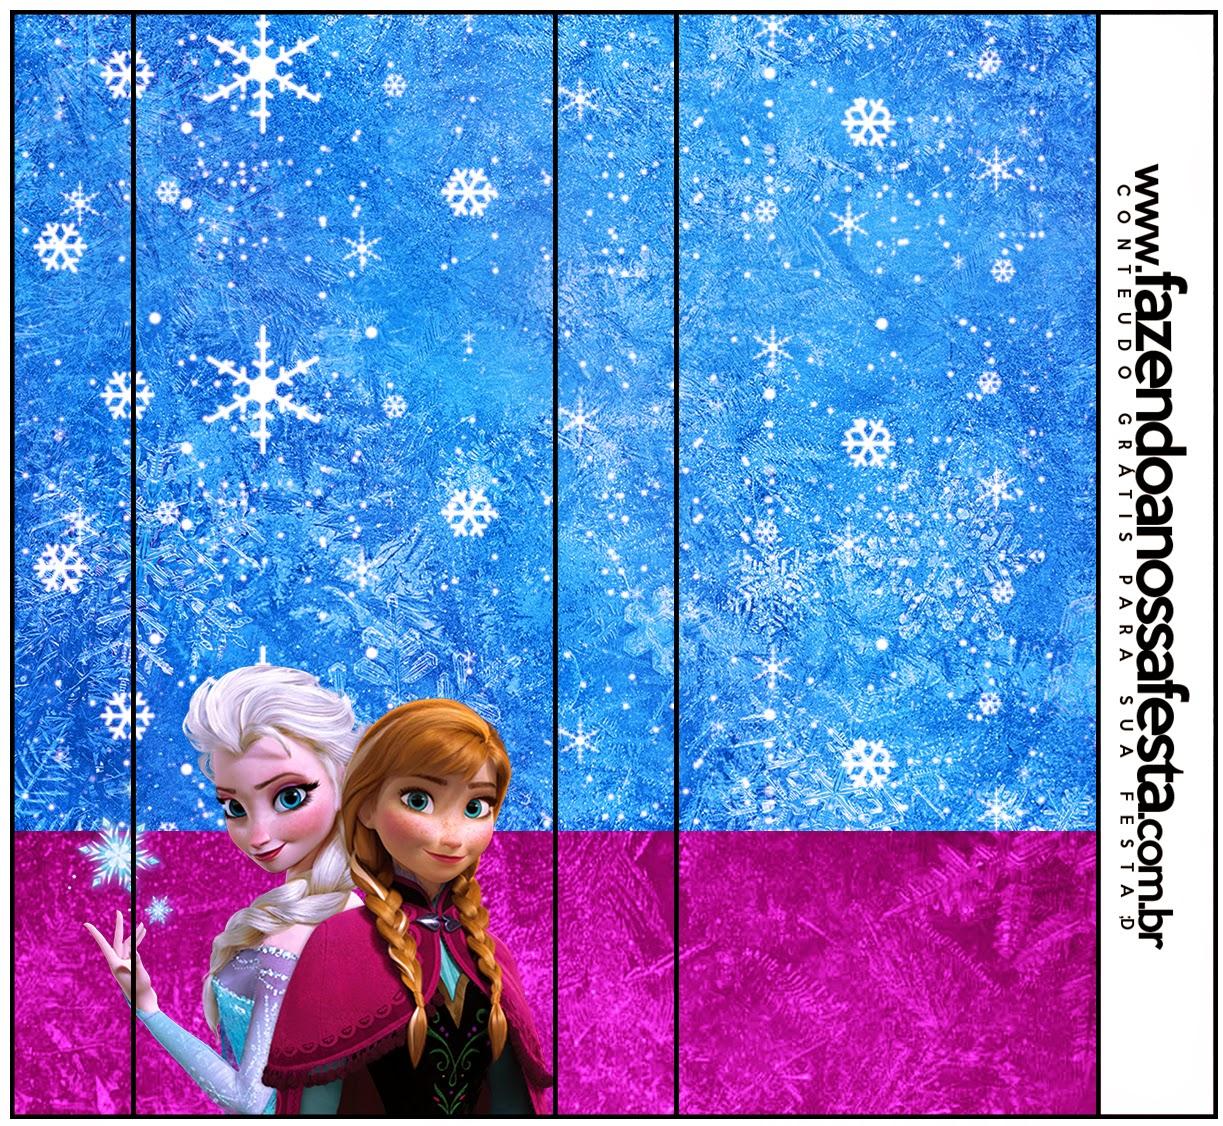 Etiqueta de Frozen Azul y purpura para imprimir gratis.